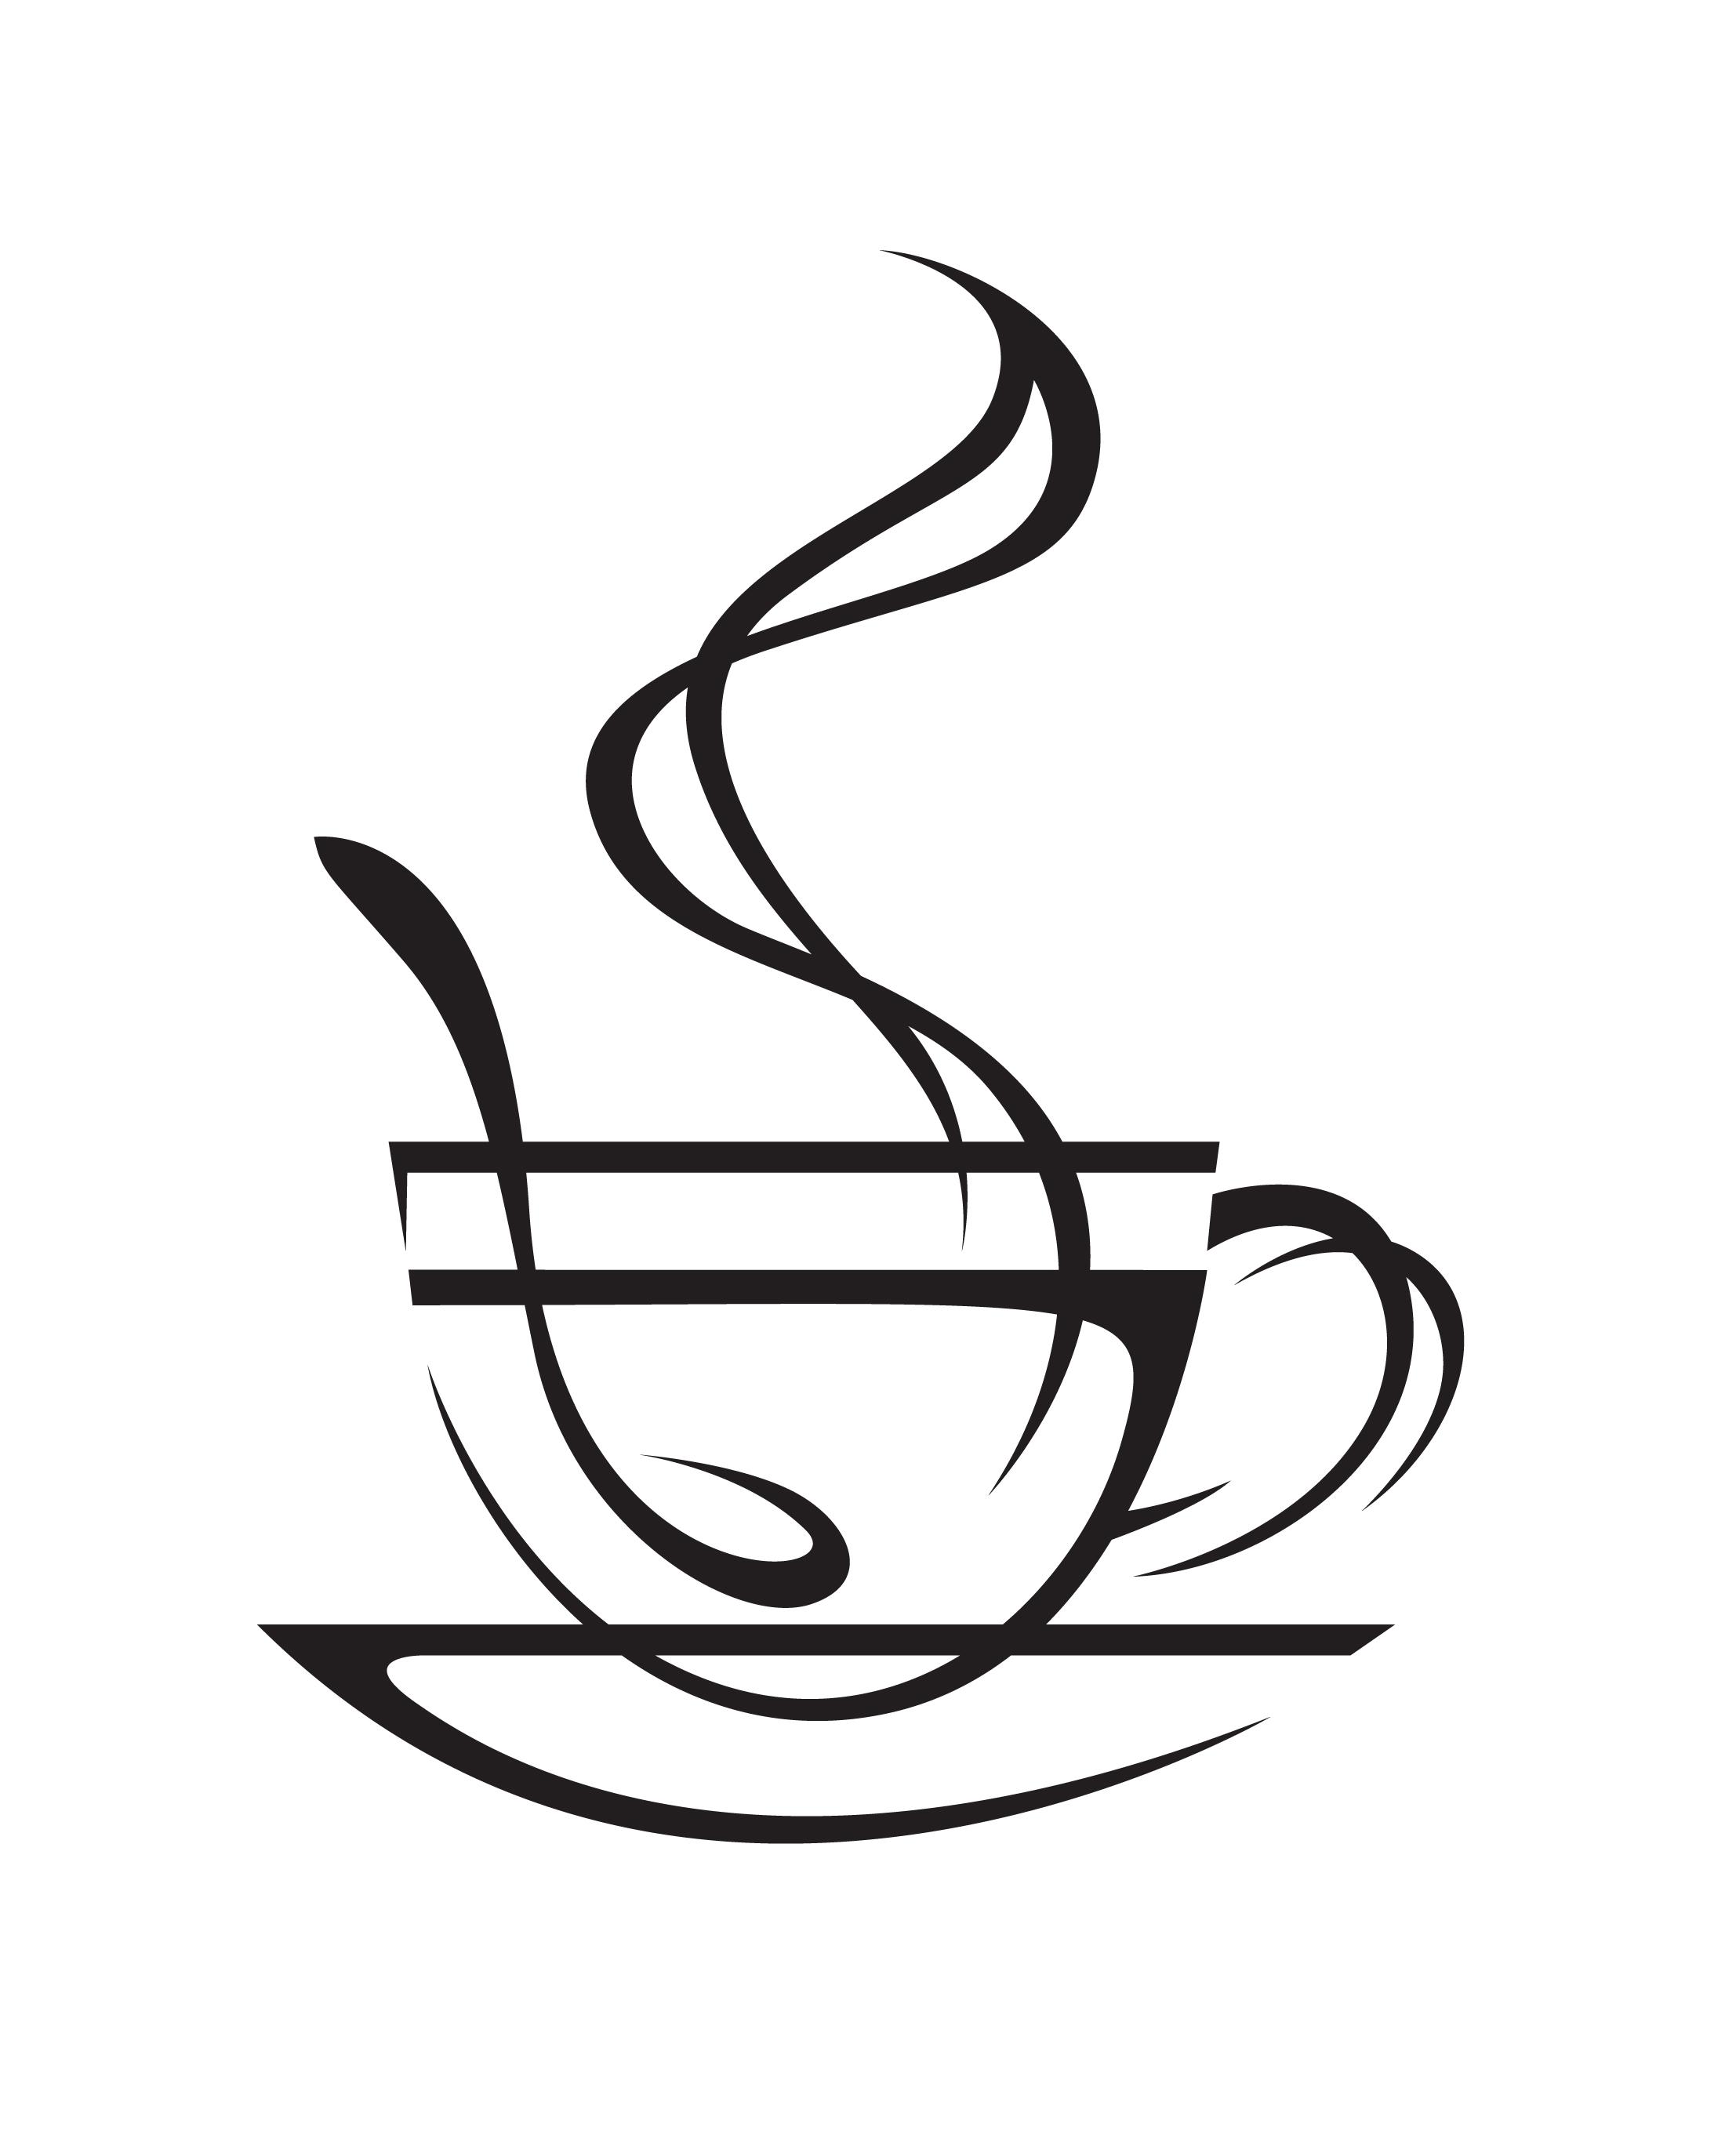 Coffee cup coffee clip art 2 image 2.